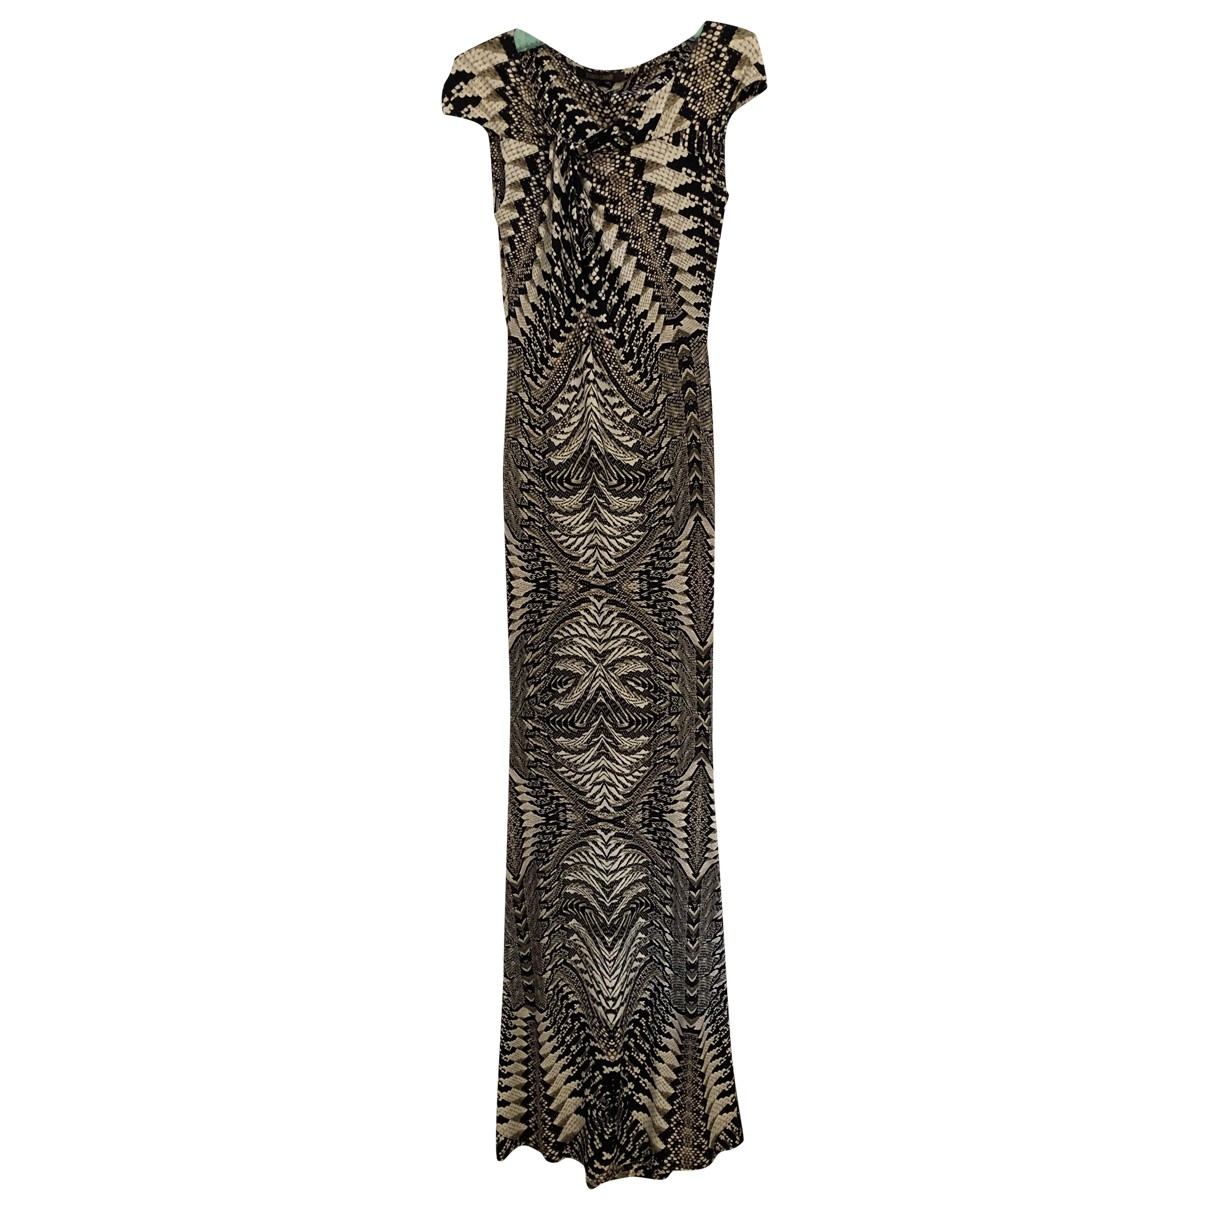 Roberto Cavalli \N Multicolour dress for Women 44 IT